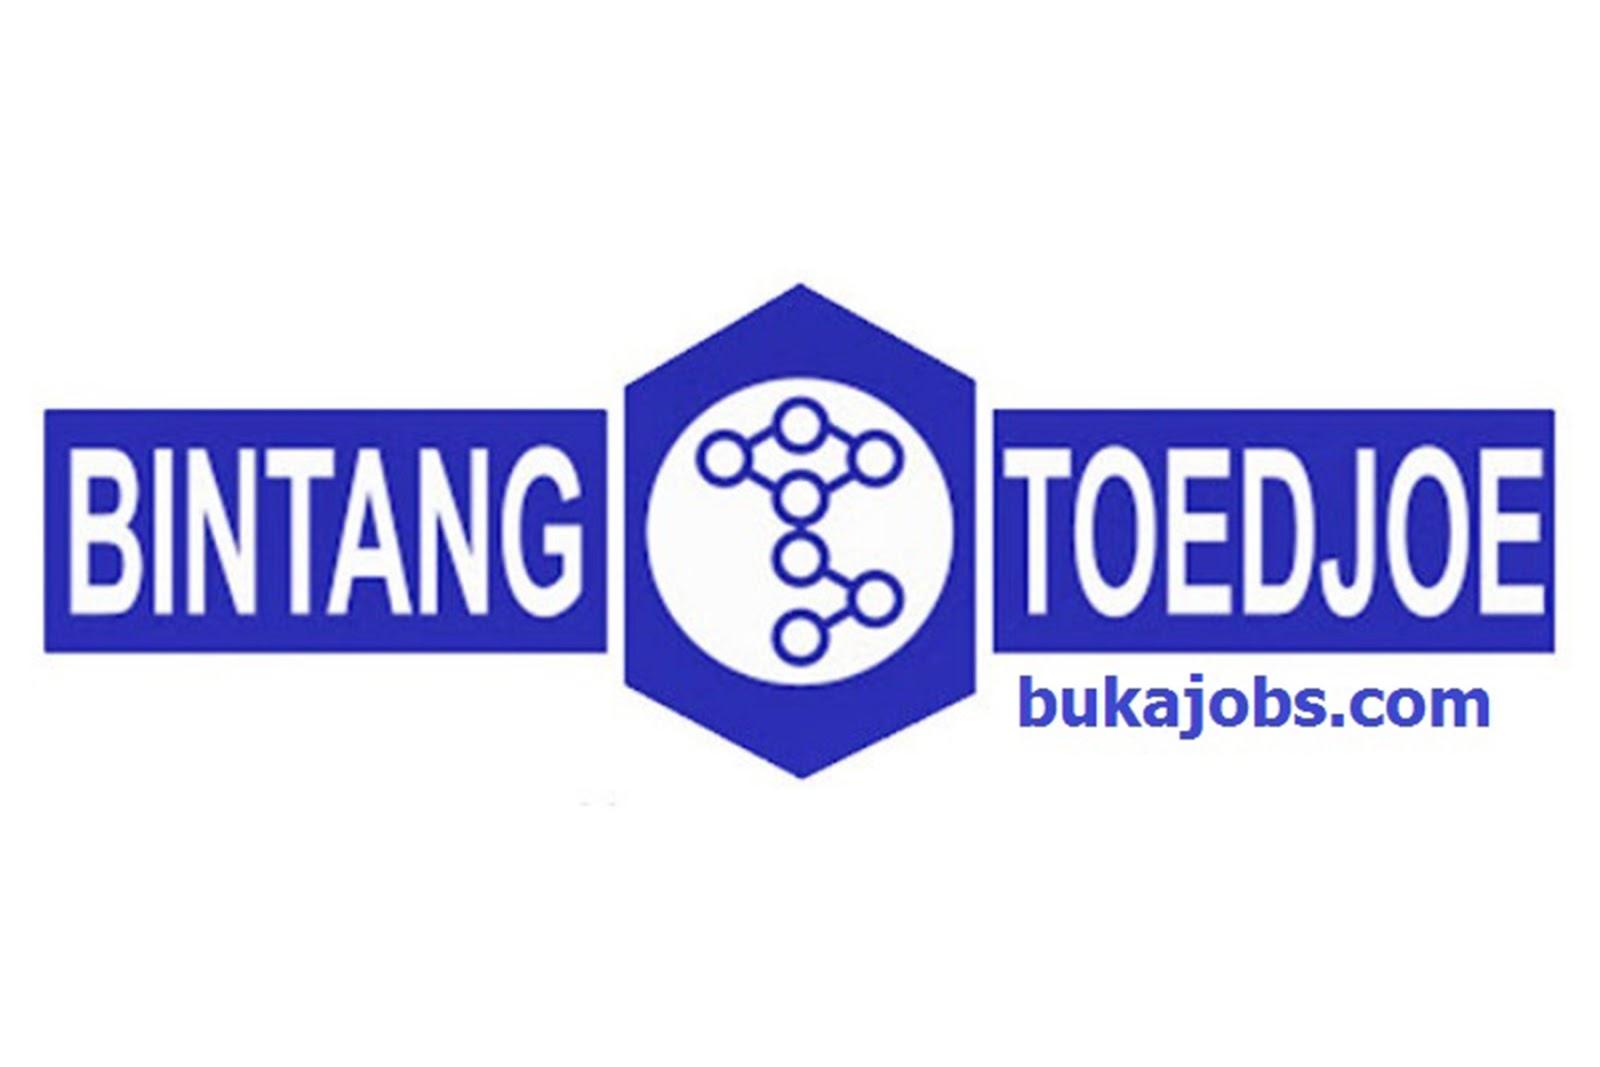 Lowongan Kerja PT. Bintang Toedjoe Terbaru Januari 2019